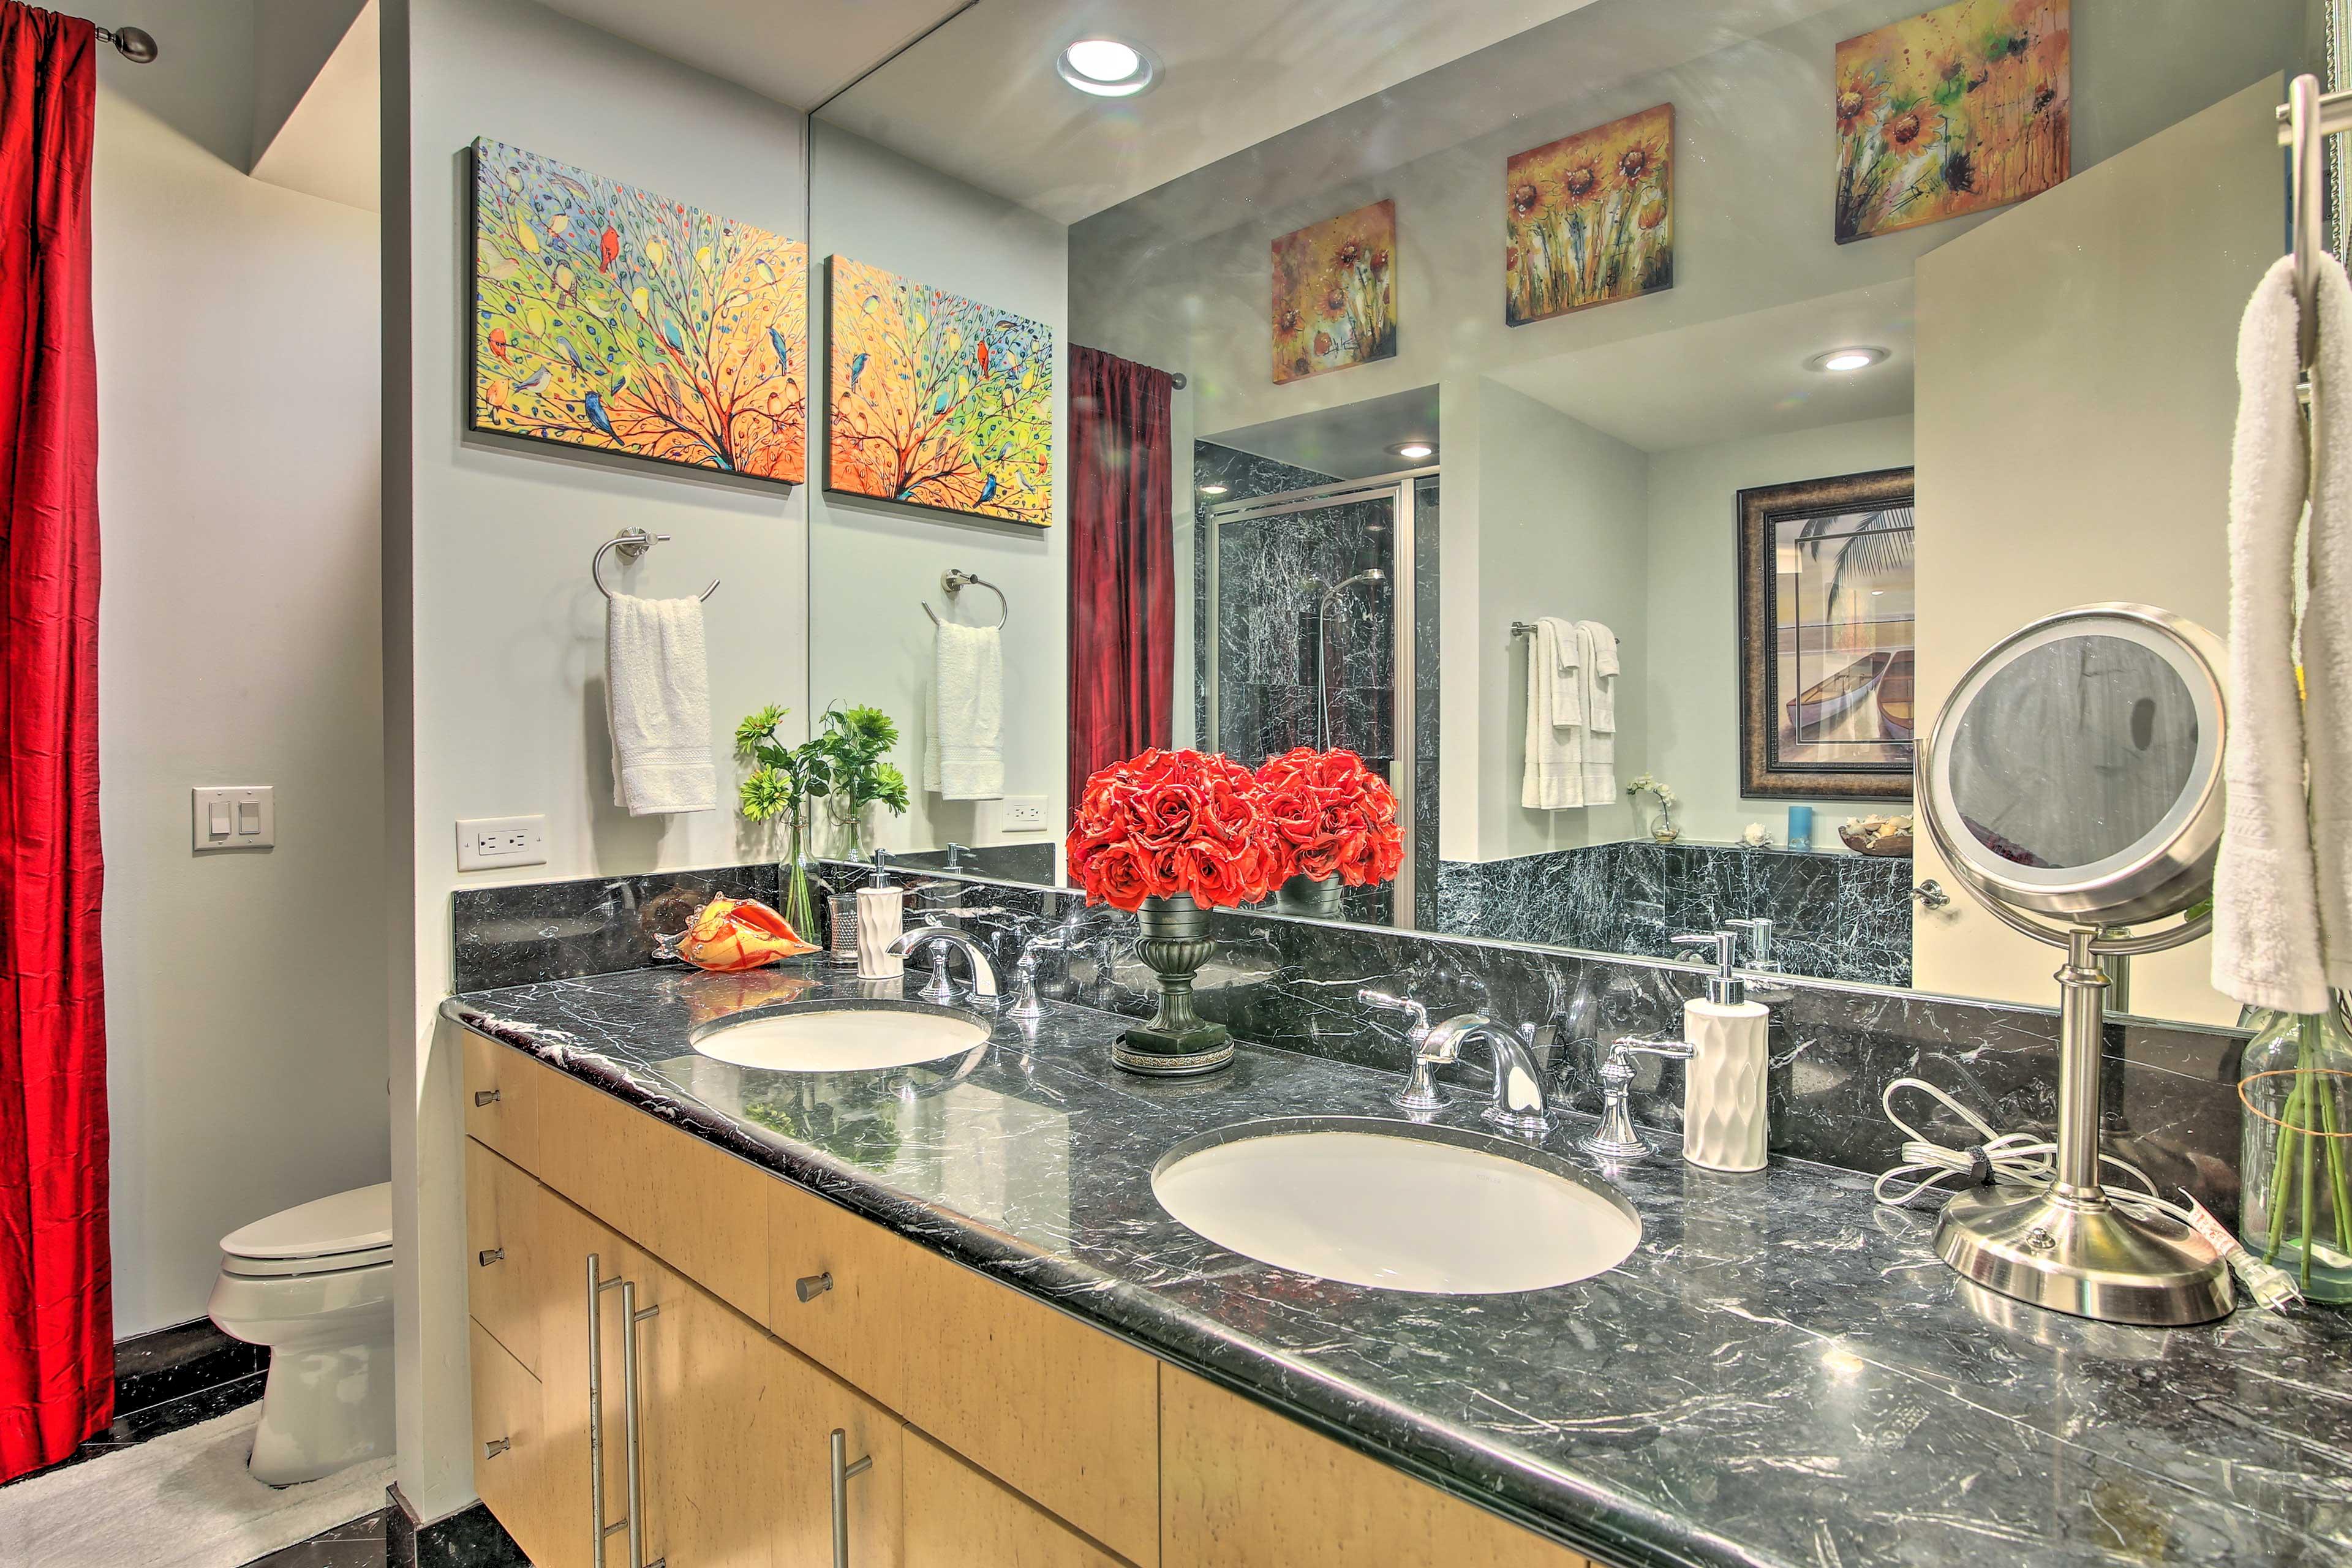 Appreciate dual sinks in the master's en-suite bathroom to easily get ready.